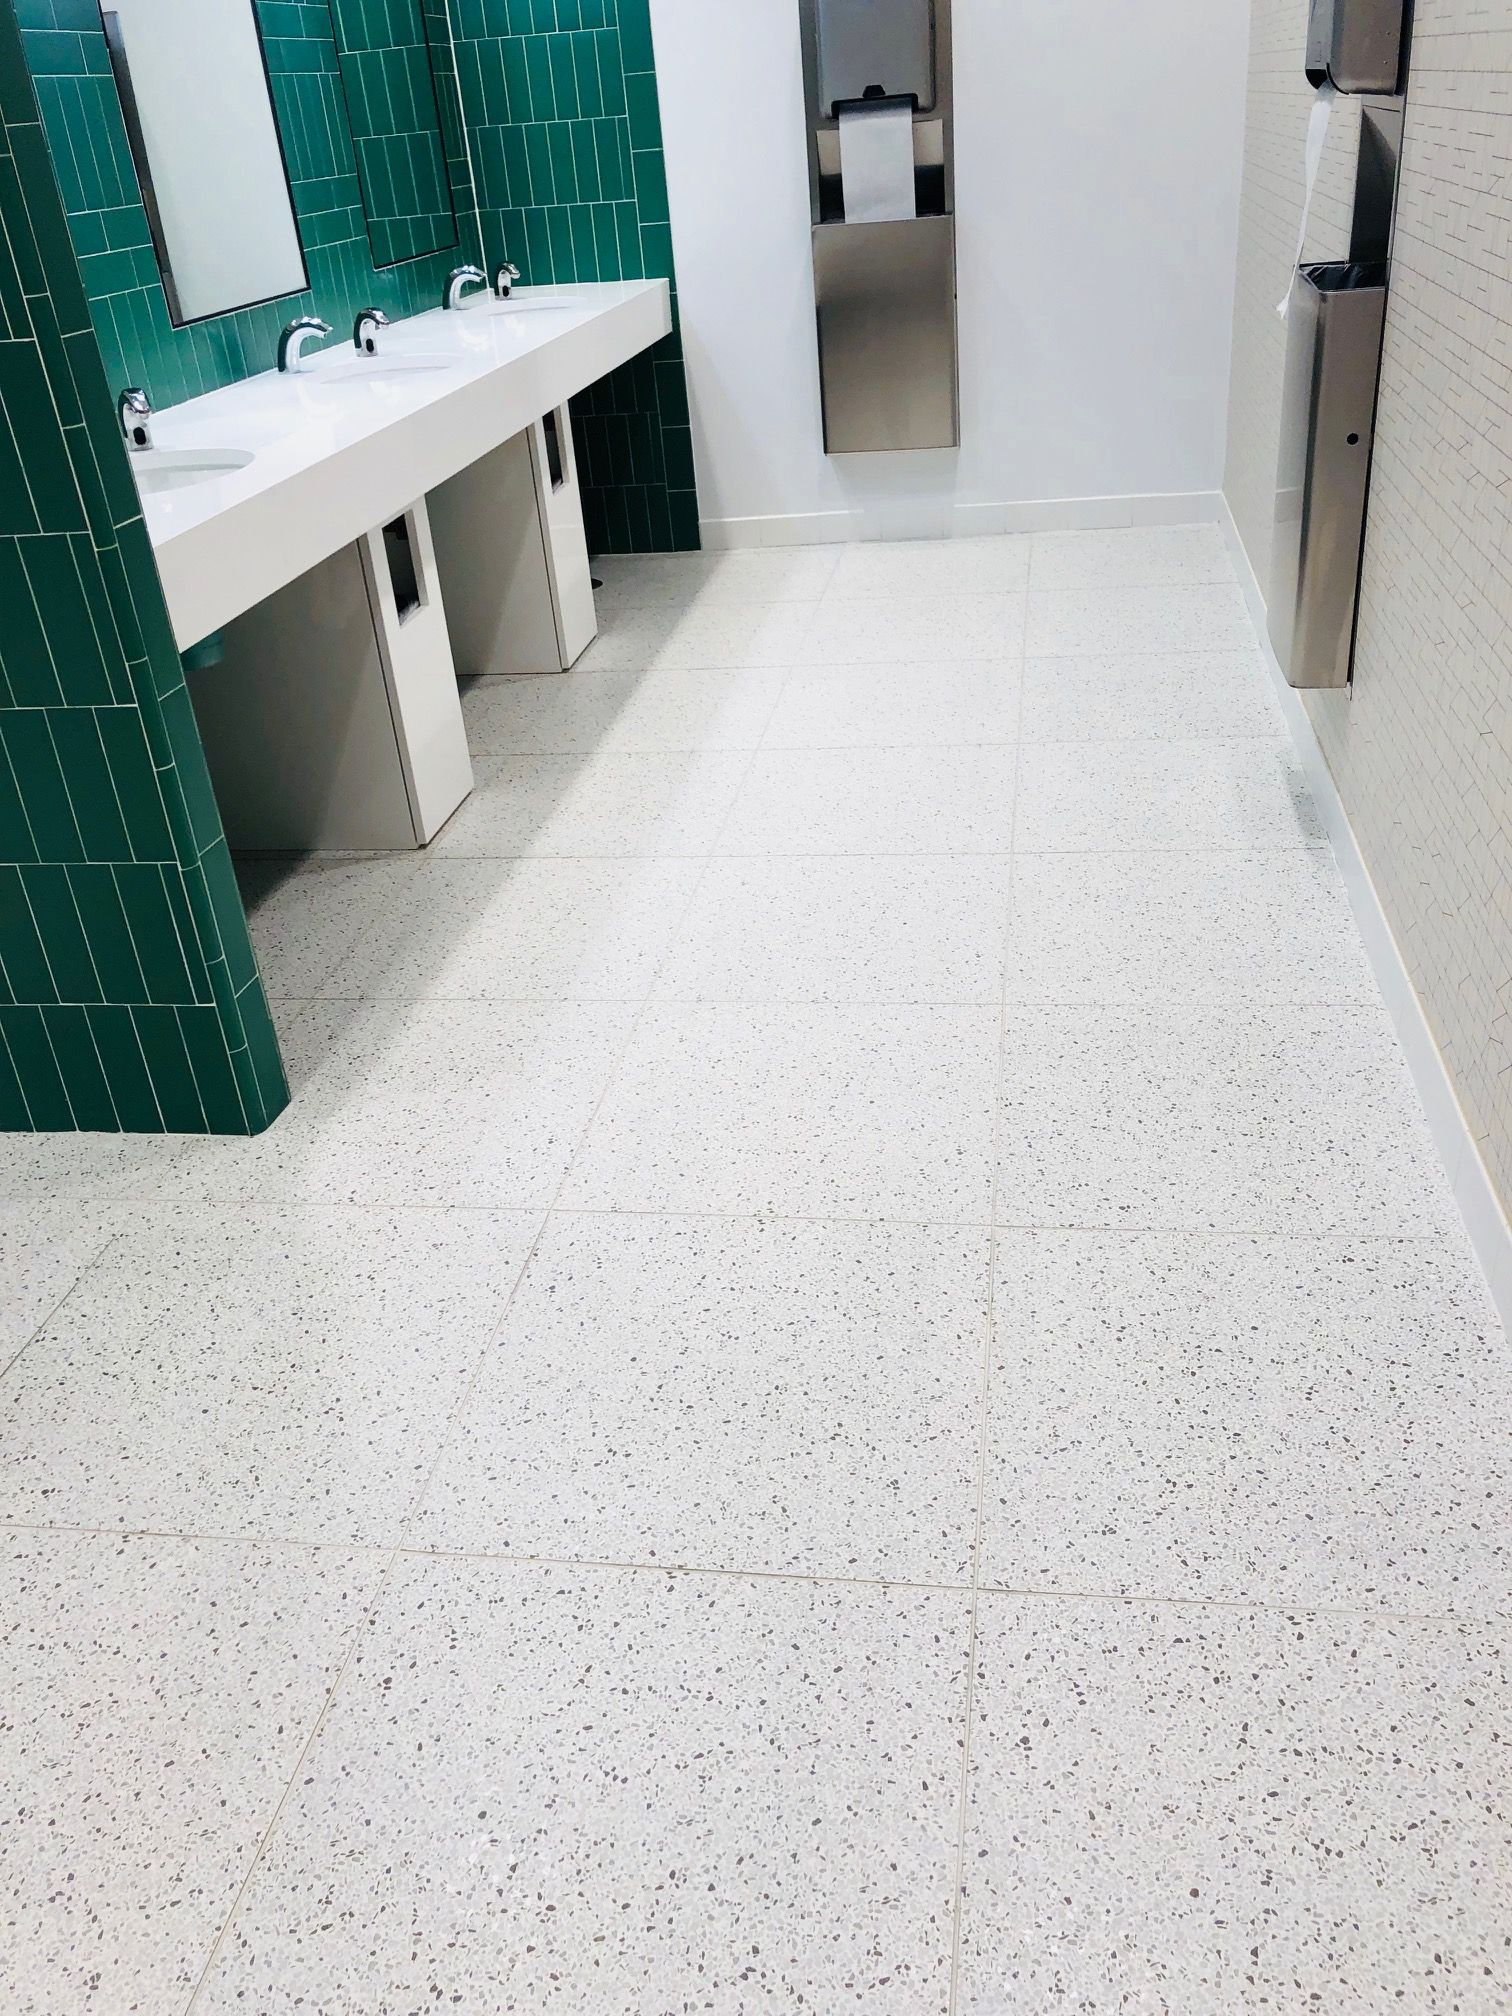 Daltile Modernist Porcelain Tile That Looks Like Terrazzo